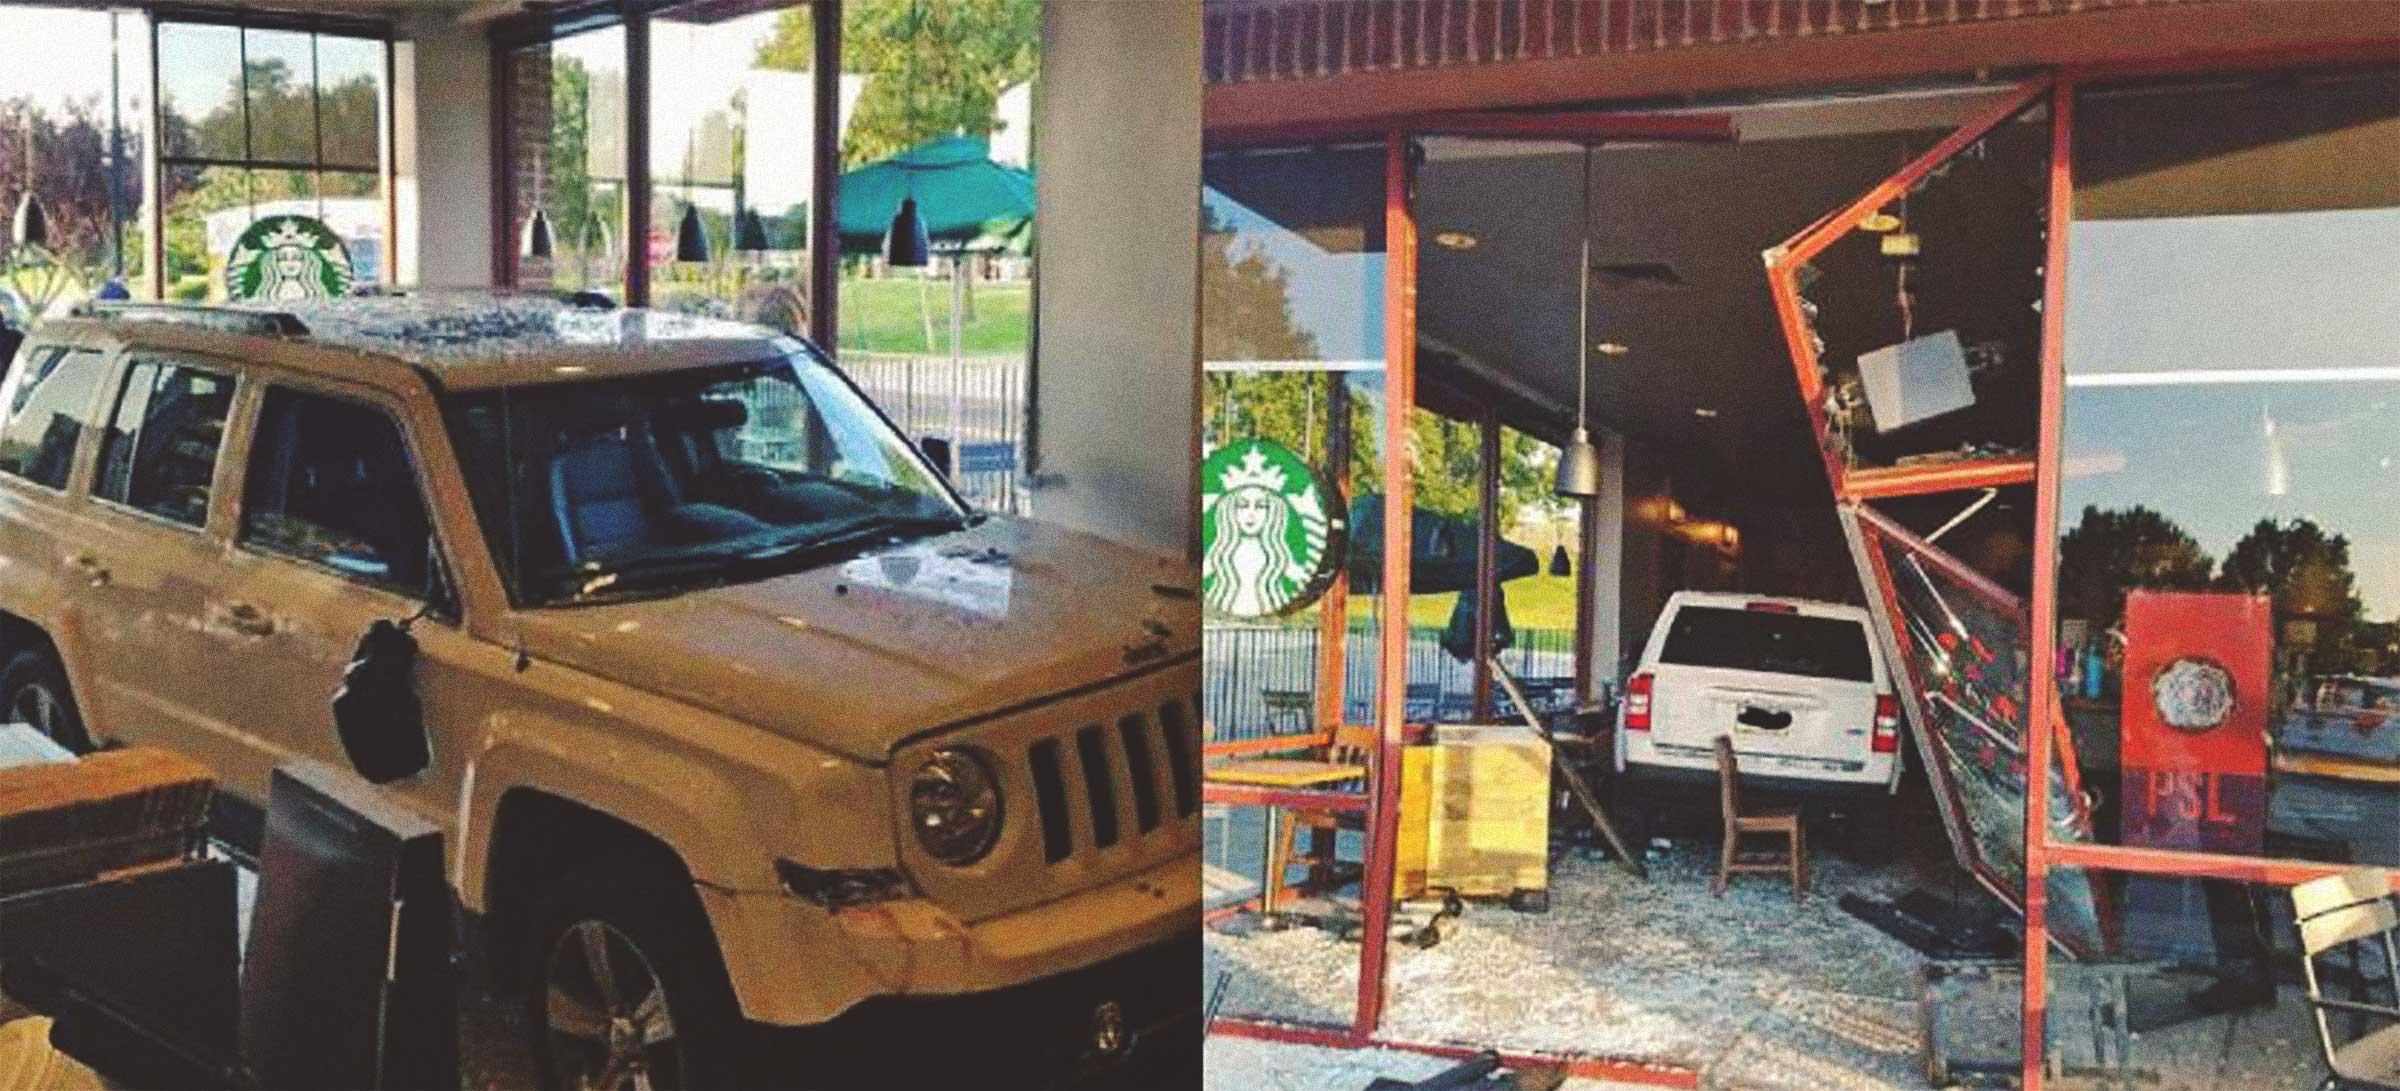 SUV-Starbucks-crash-WC-PA-2400px.jpg